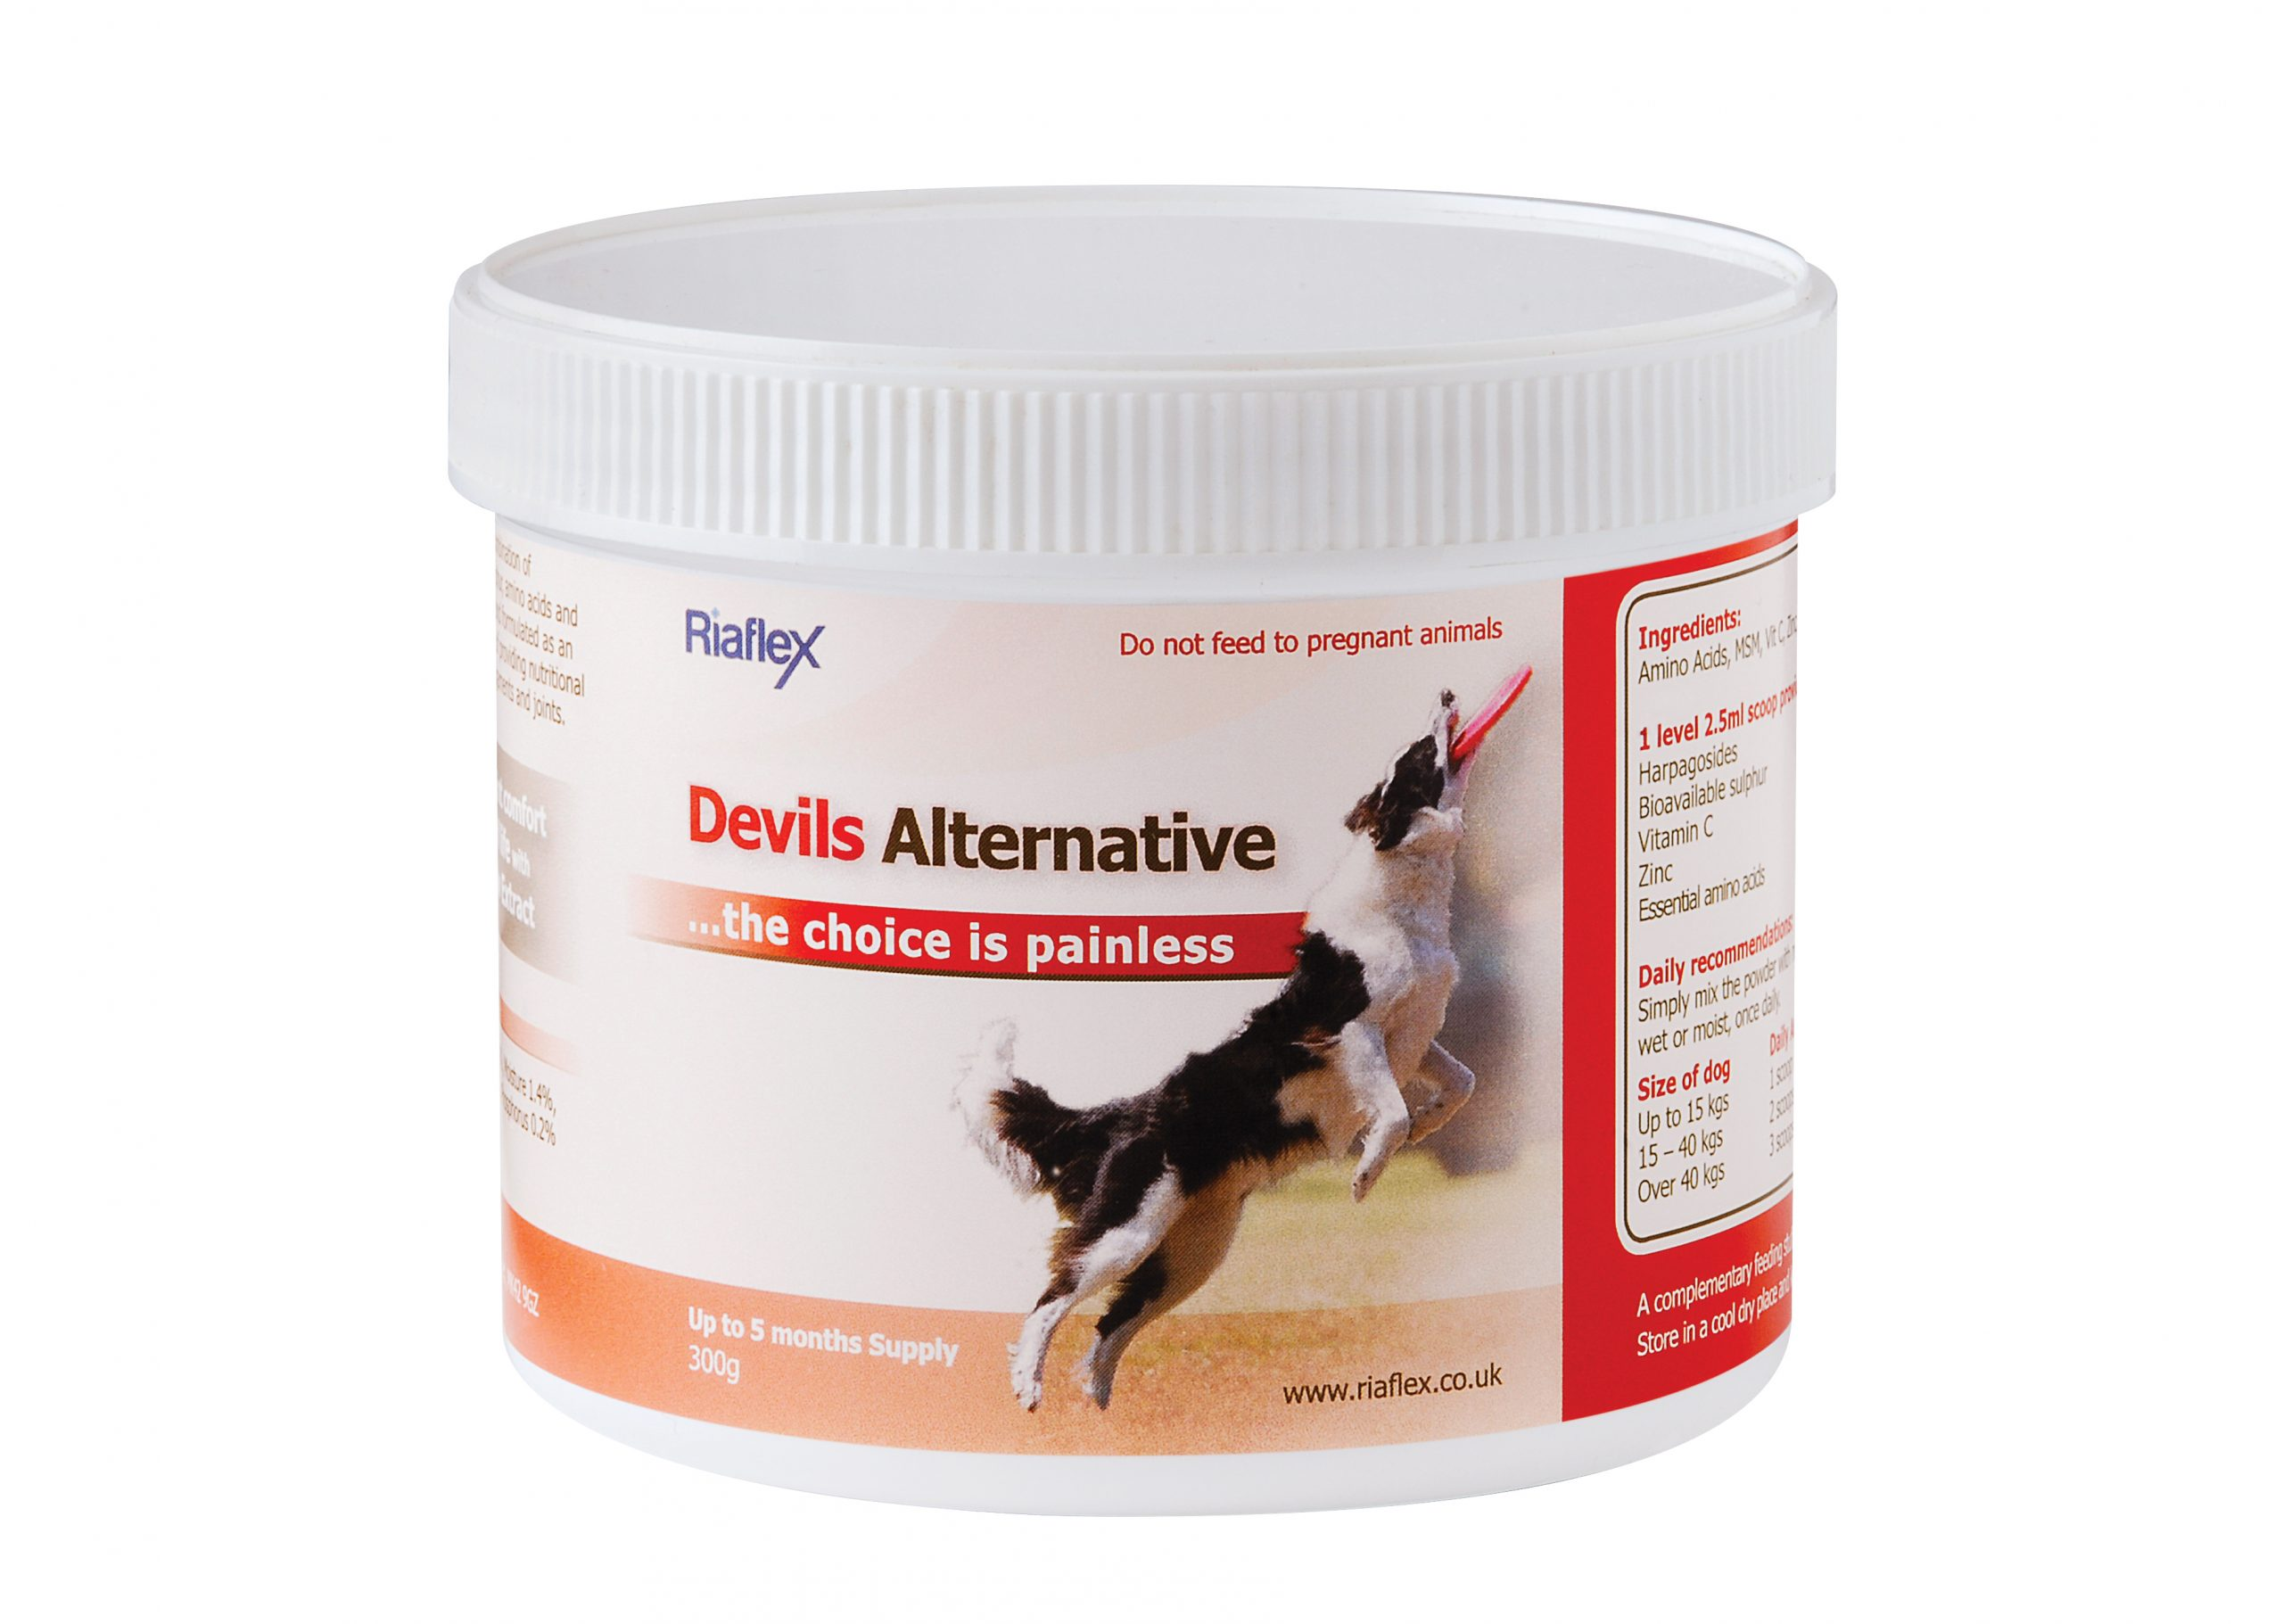 RIAFLEX DEVILS ALTERNATIVE 300g-0